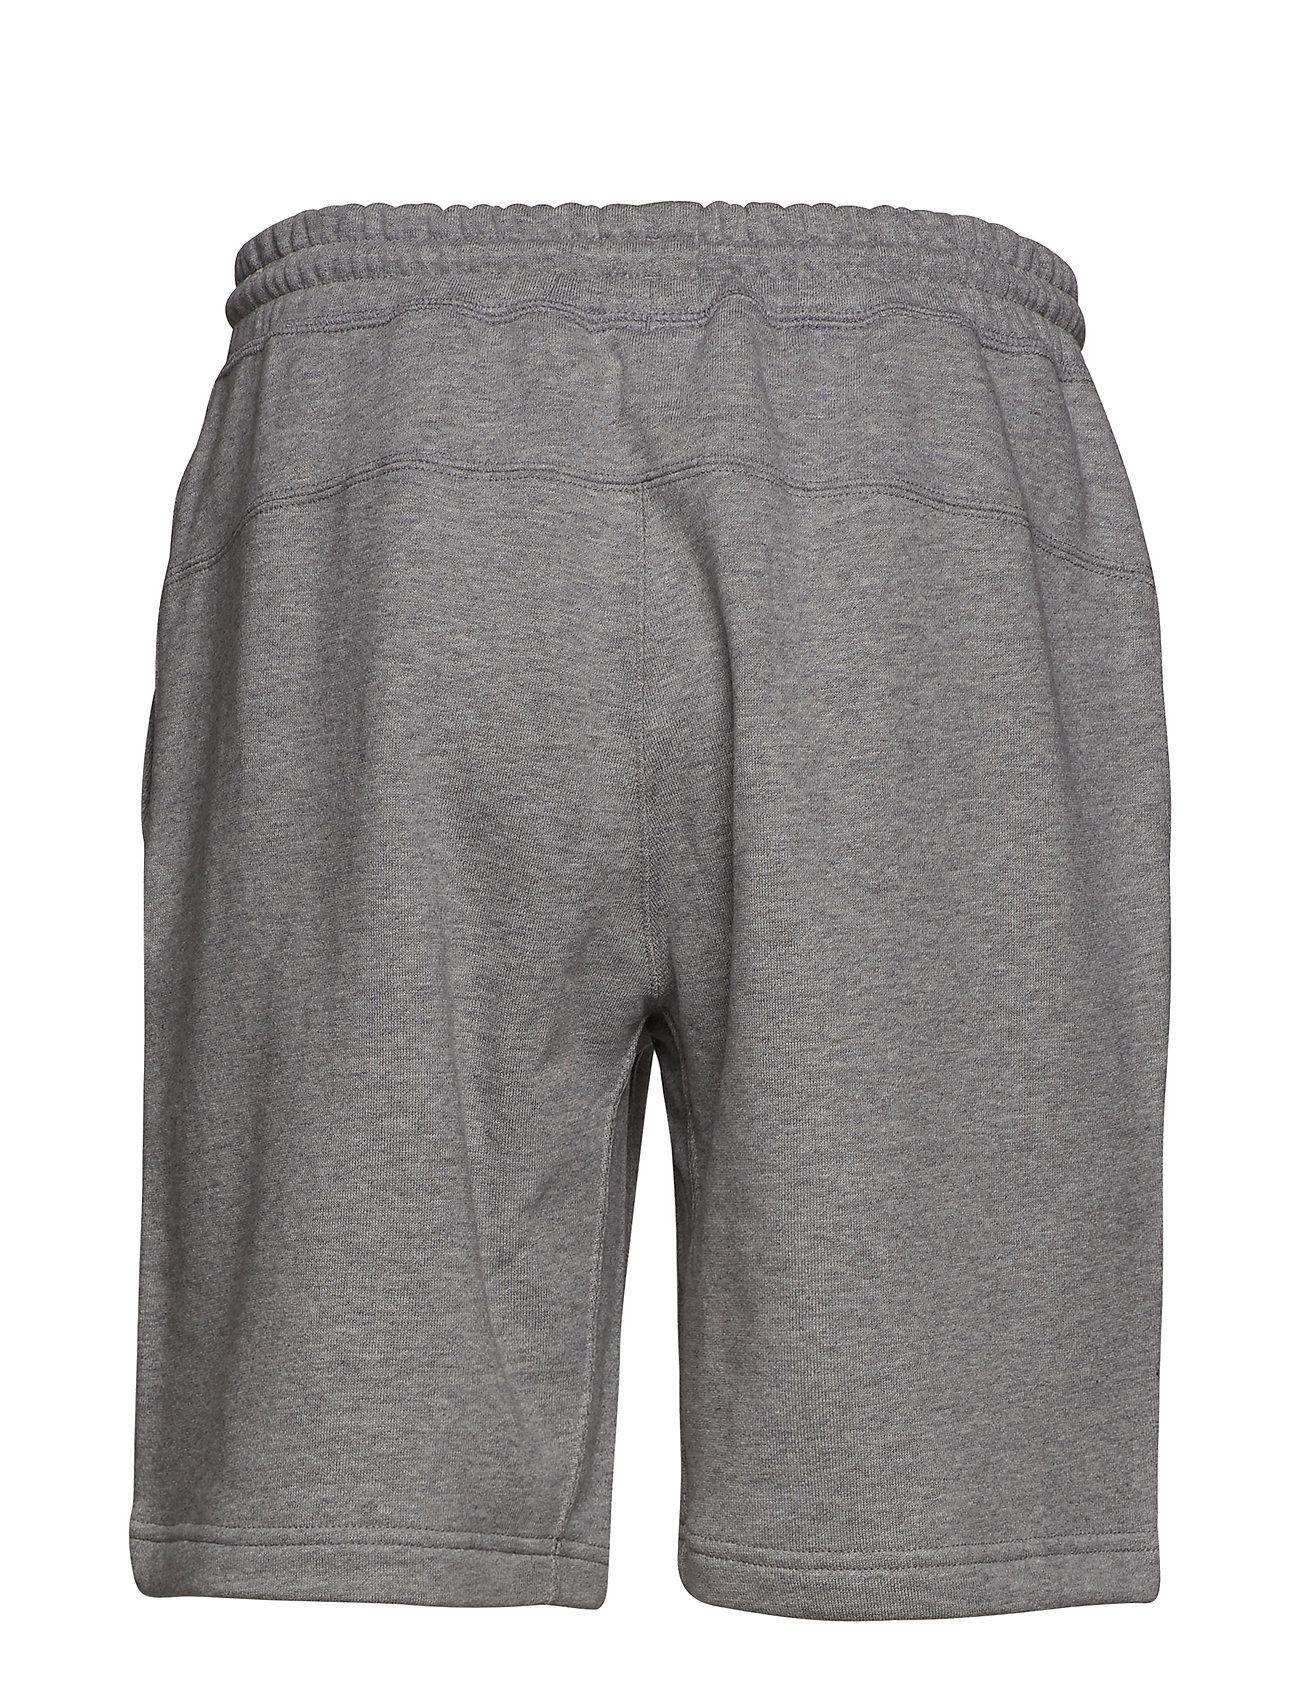 9b548a39 Sort Adidas Short bermuda shorts for herre - Pashion.dk